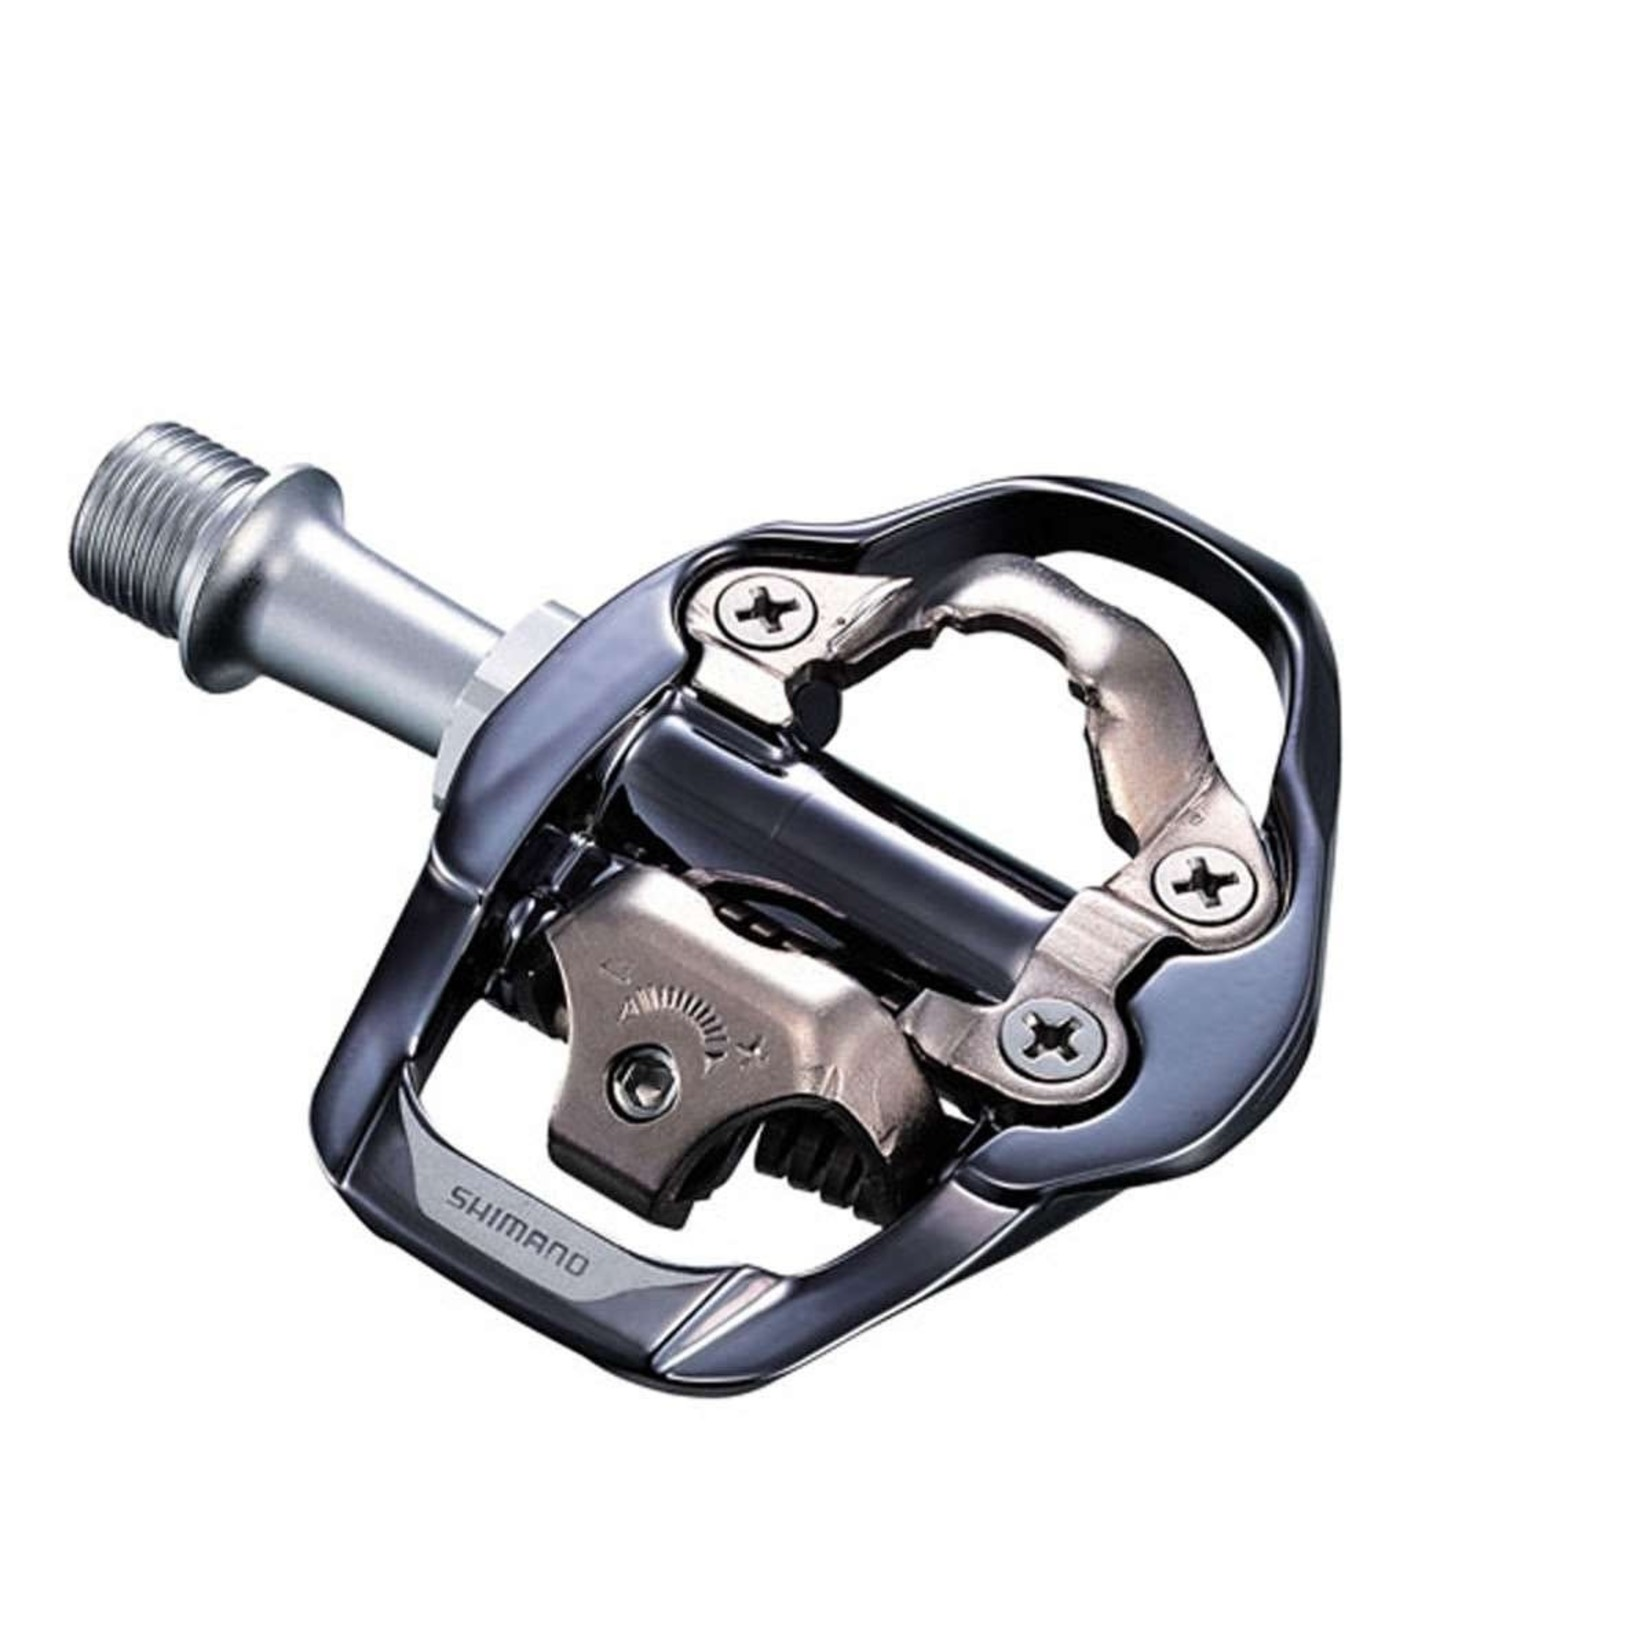 Shimano Shimano A600 SPD Aluminum Pedal